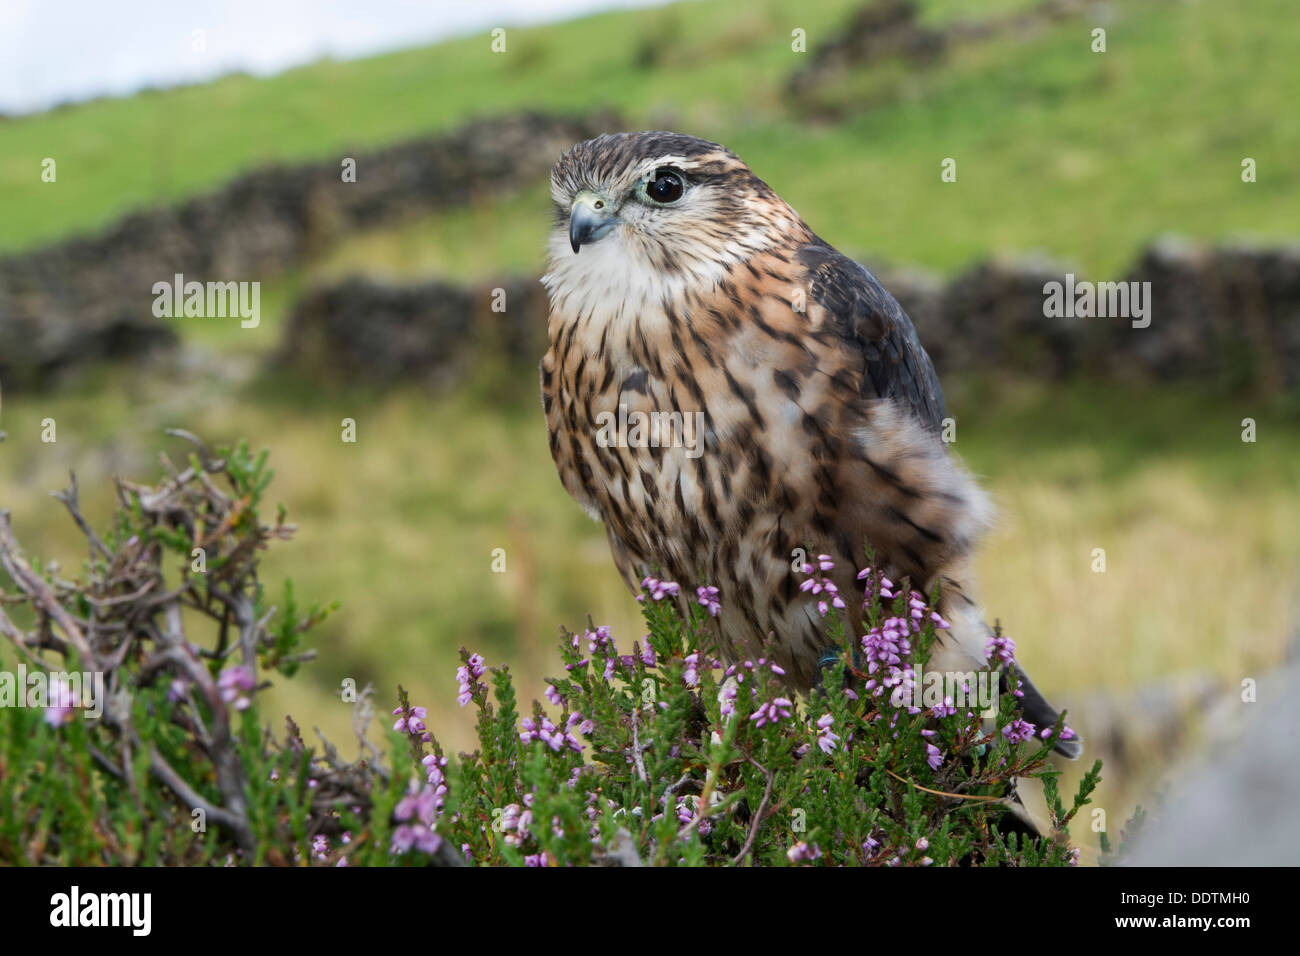 Male Merlin, Falco columbarius, on heather moorland, Yorkshire, UK. Captive bird. - Stock Image